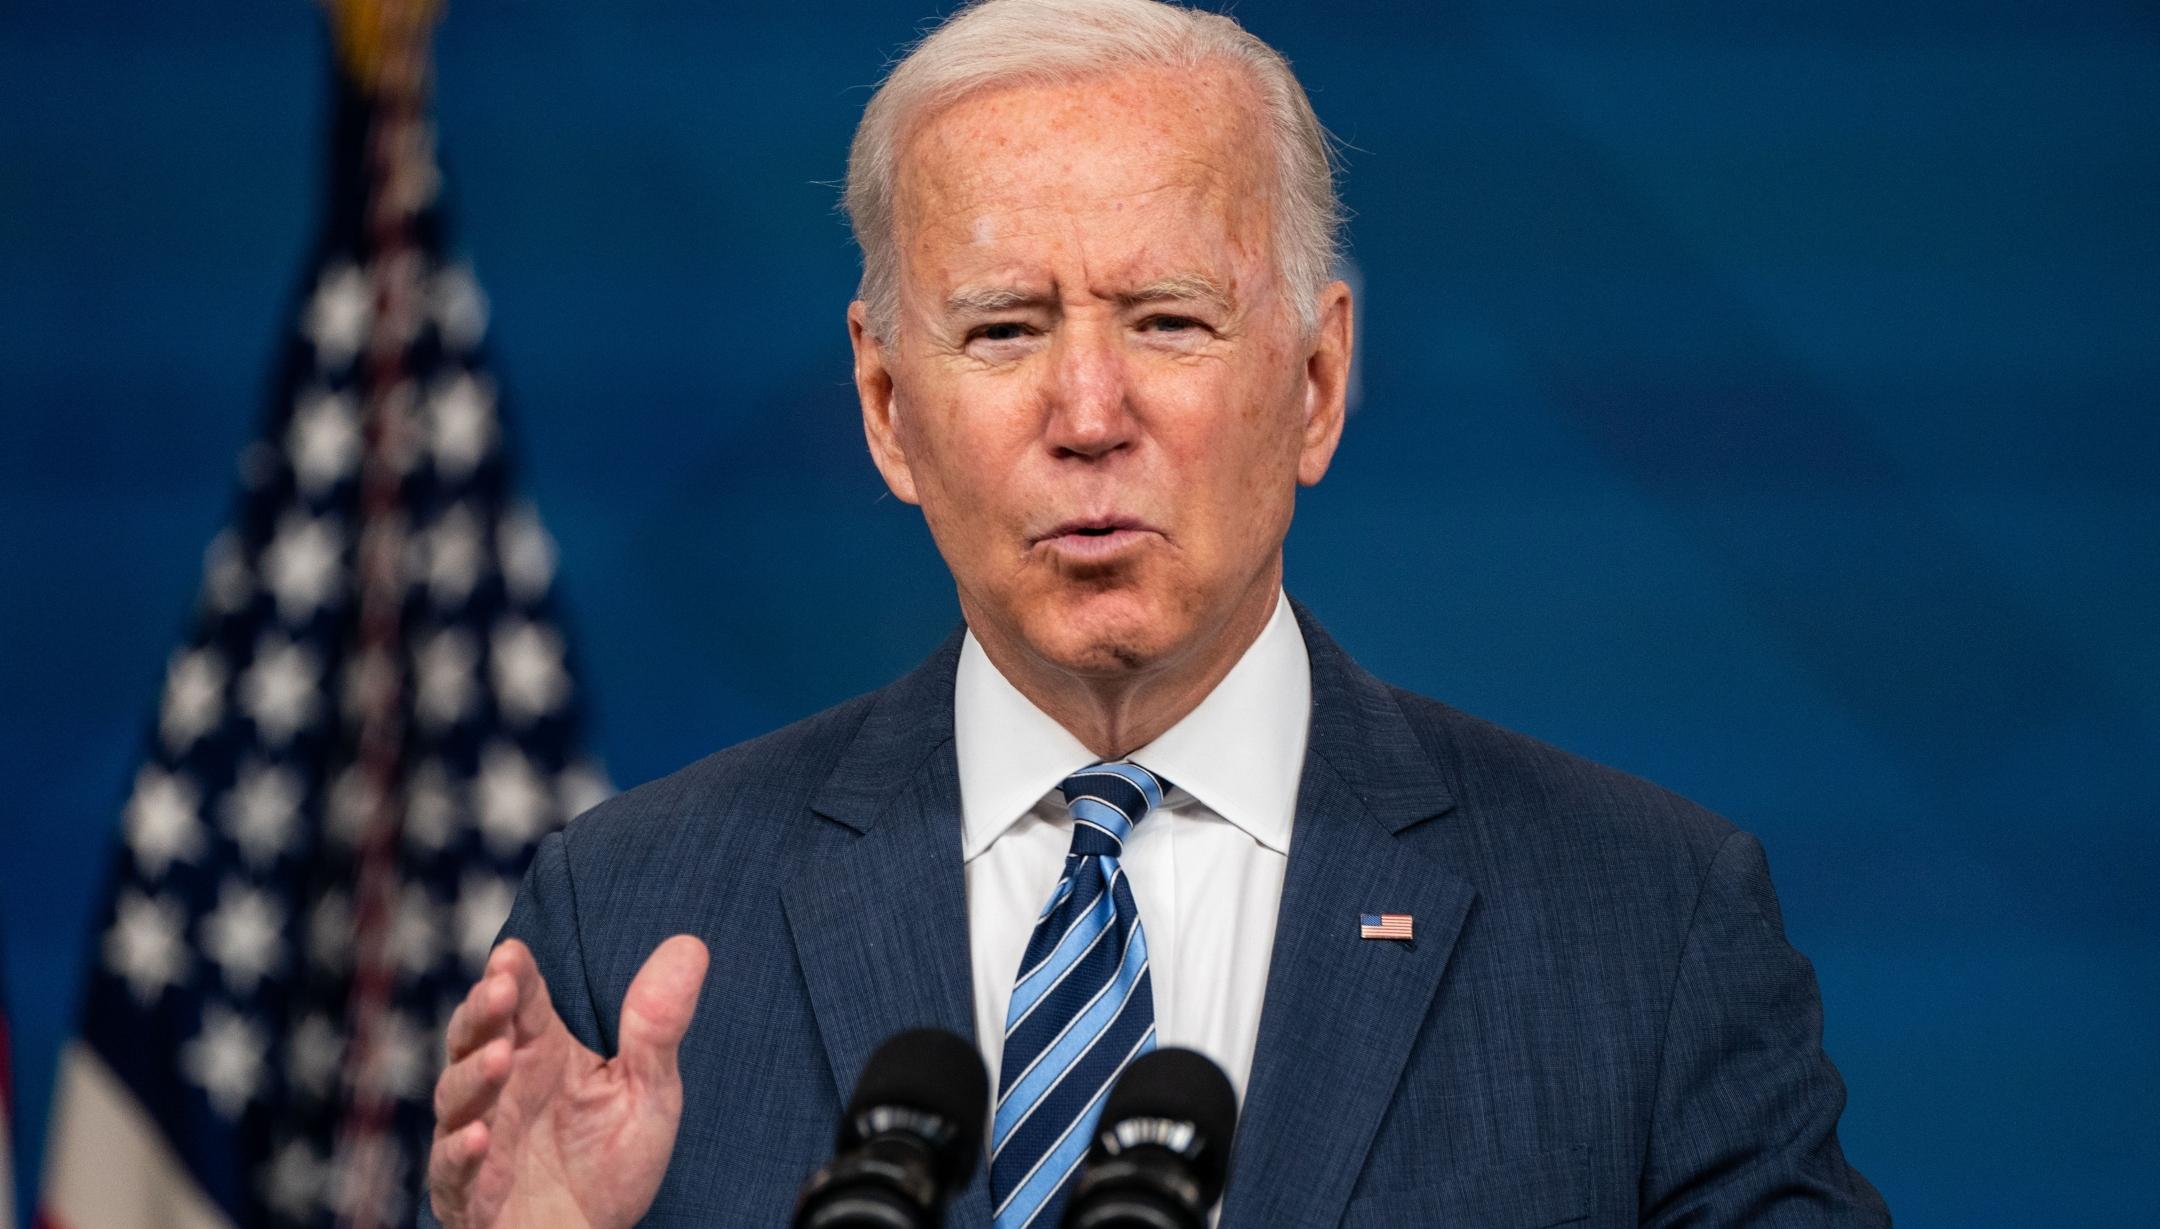 In Rosh Hashanah call with rabbis, Biden calls for 'swift confirmation' of Deborah Lipstadt to...